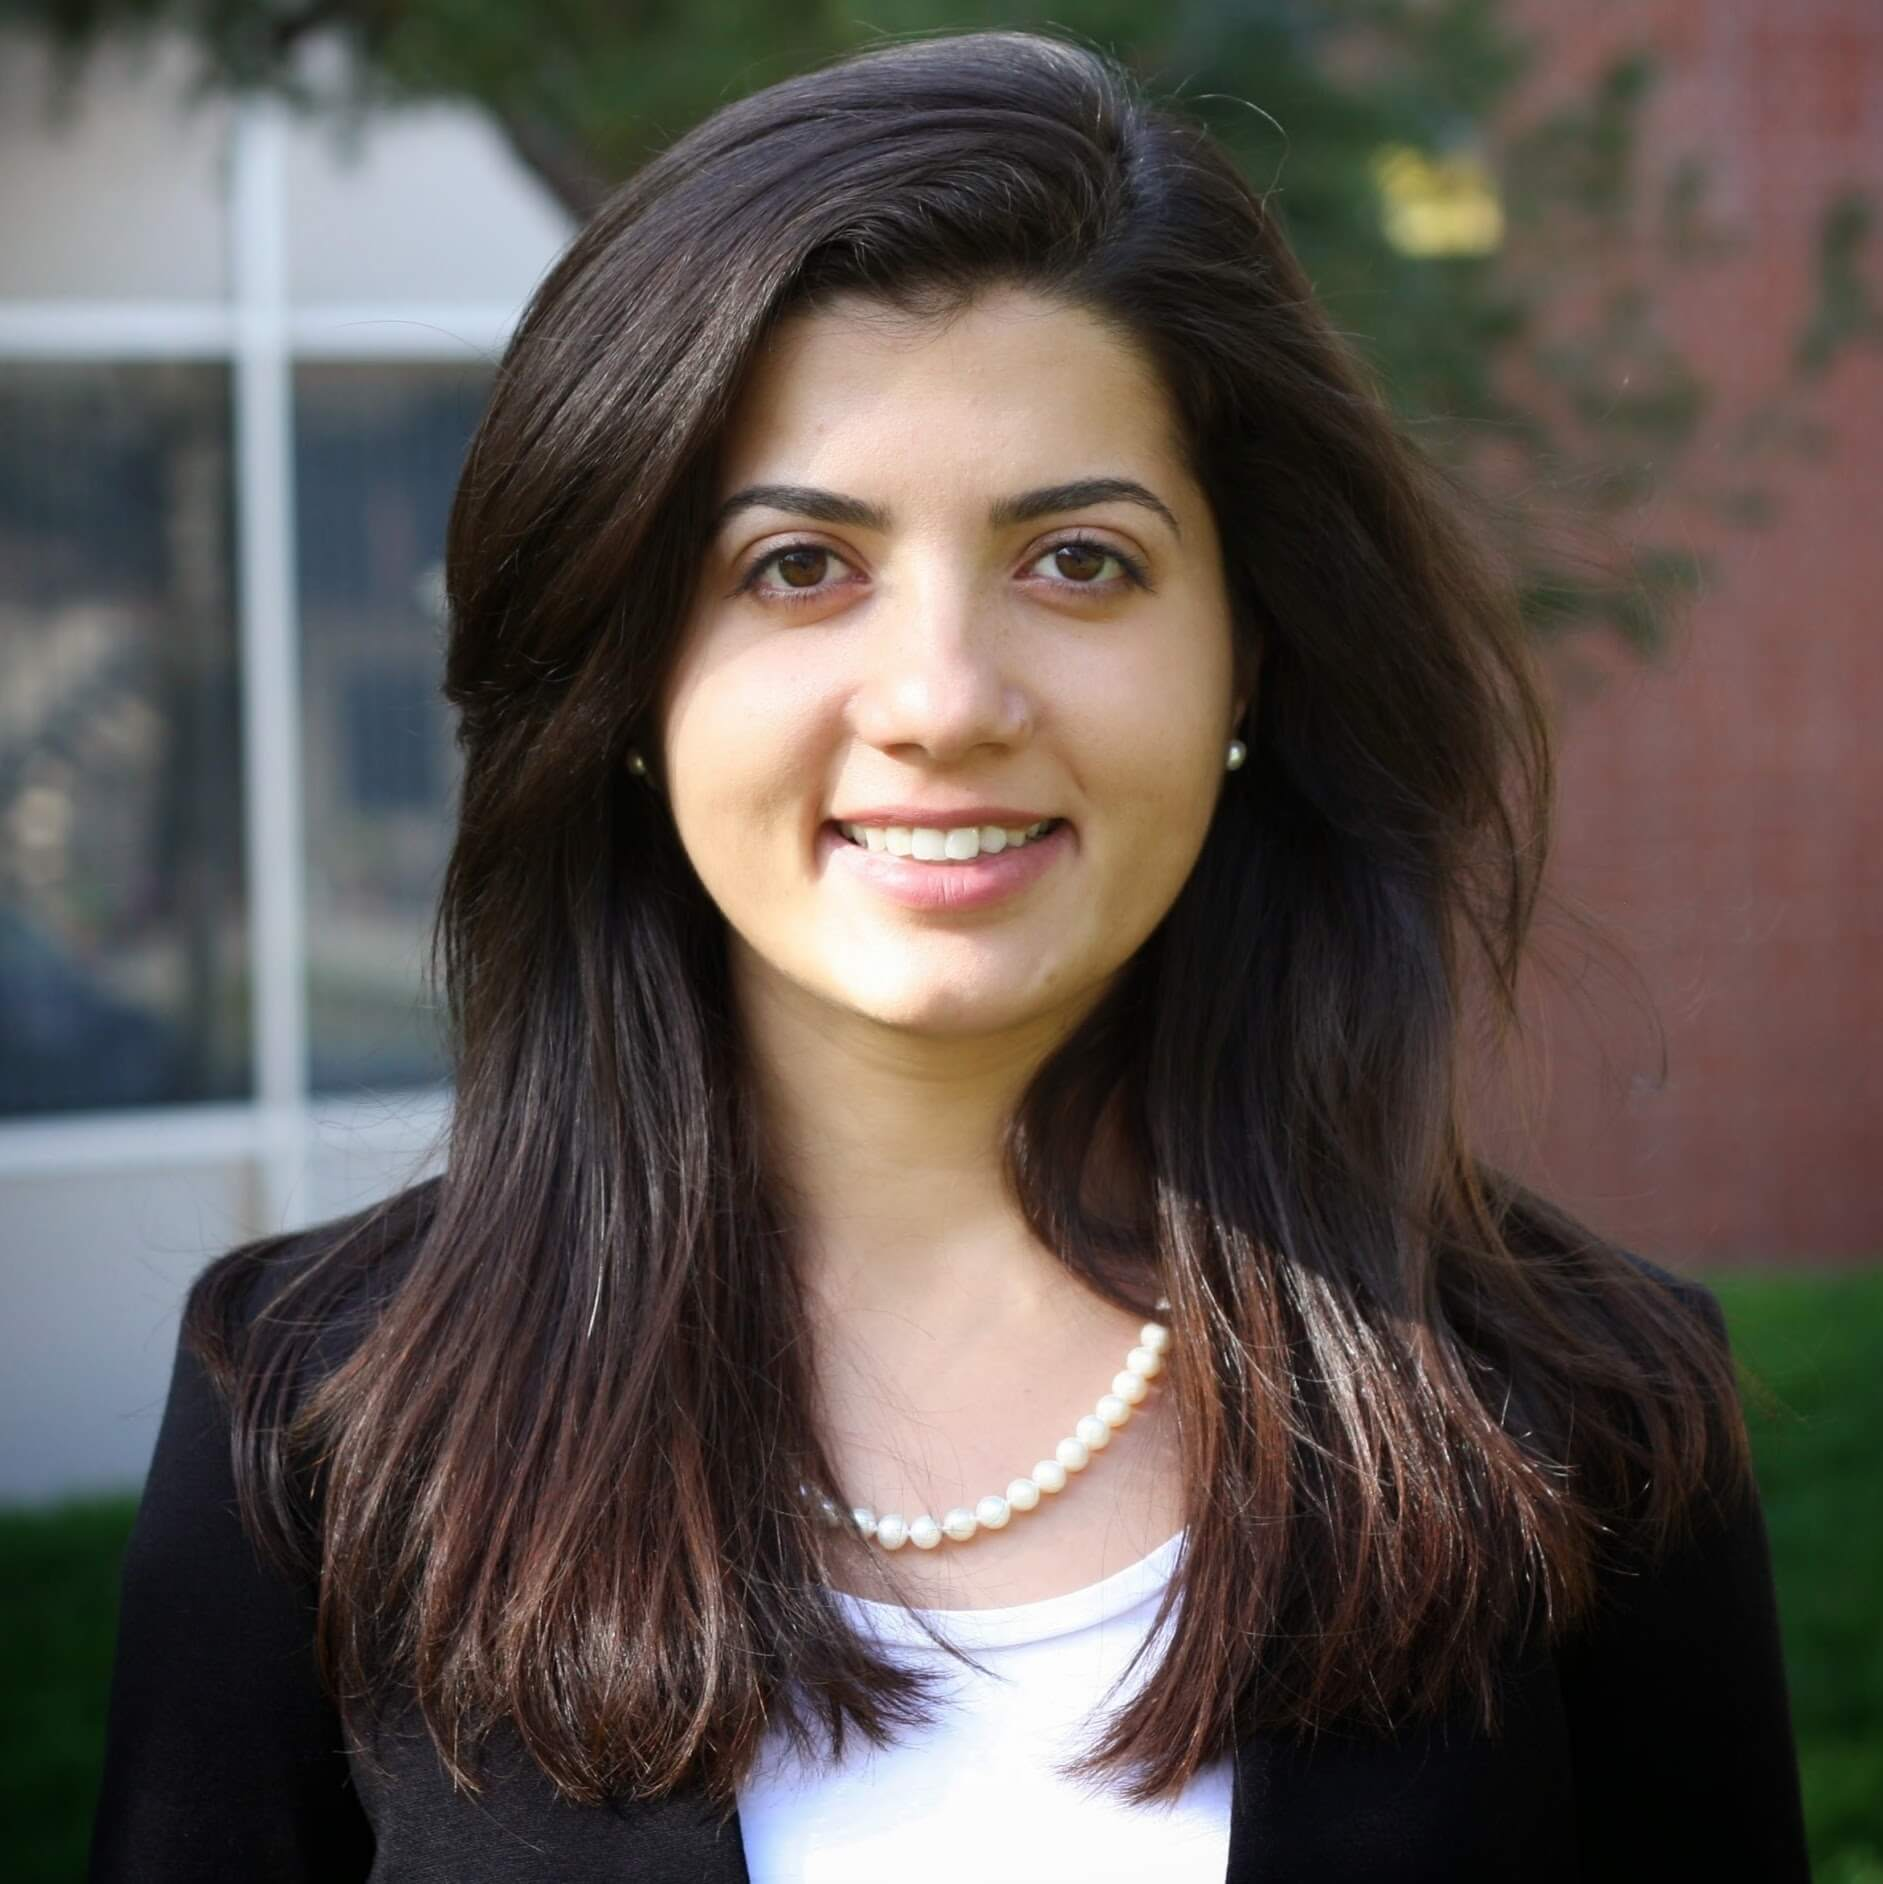 Anita Nosratieh, PhD